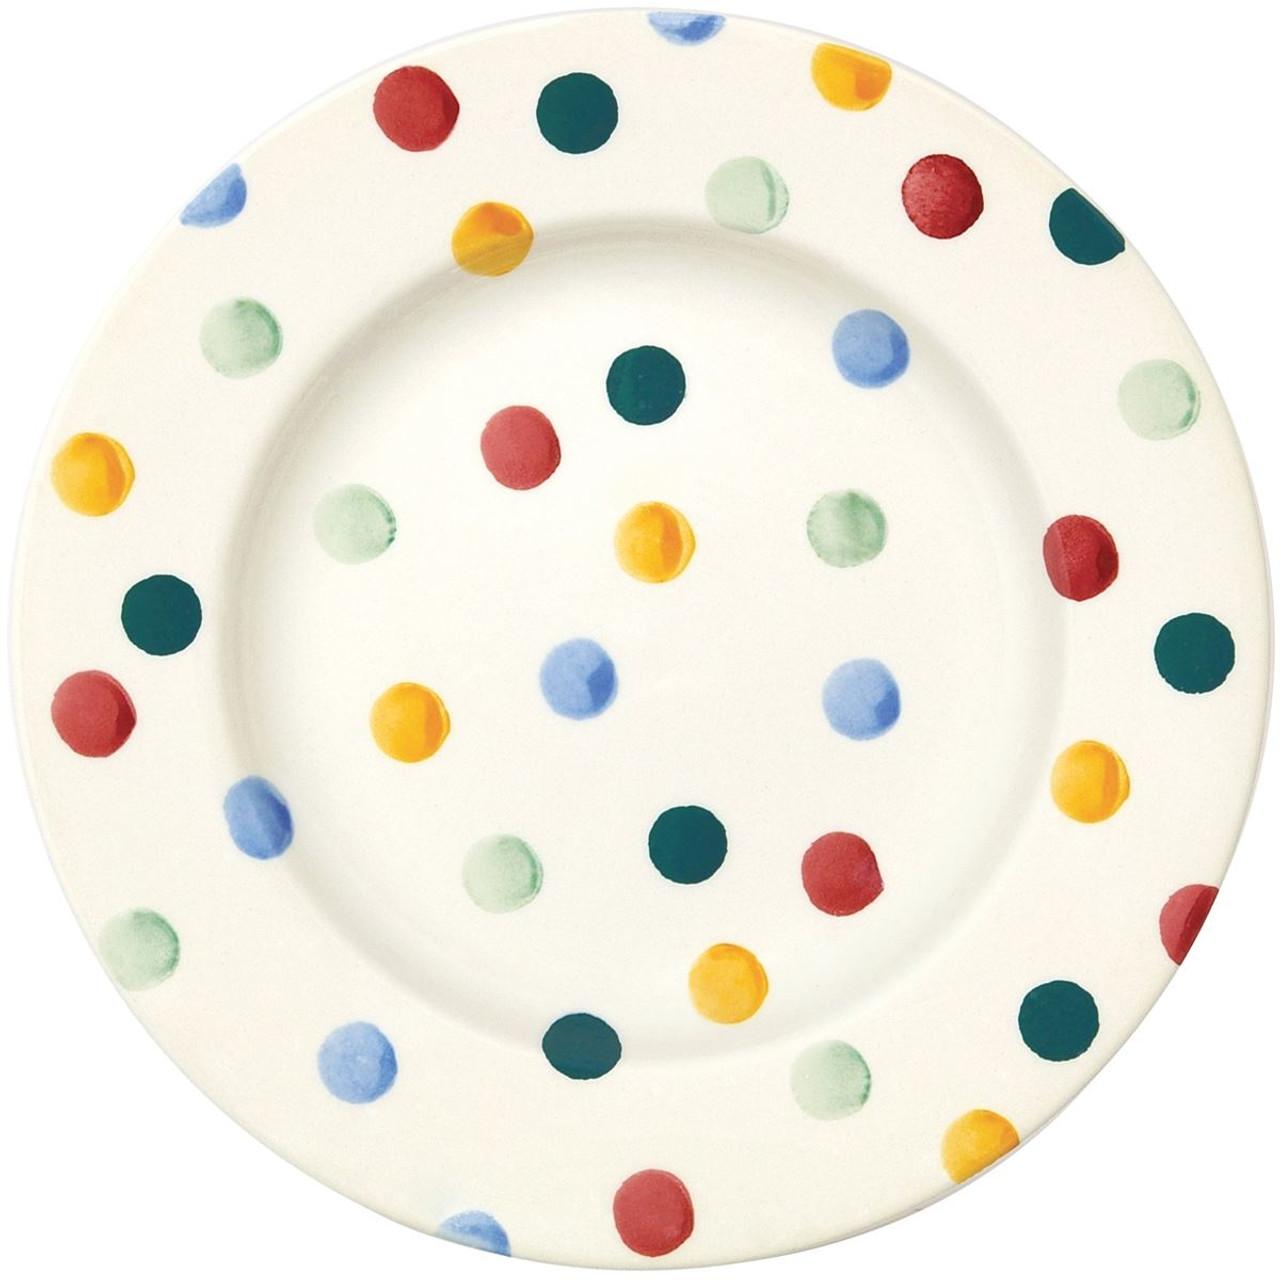 Emma Bridgewater Polka Dot 8.5 Inch Plate